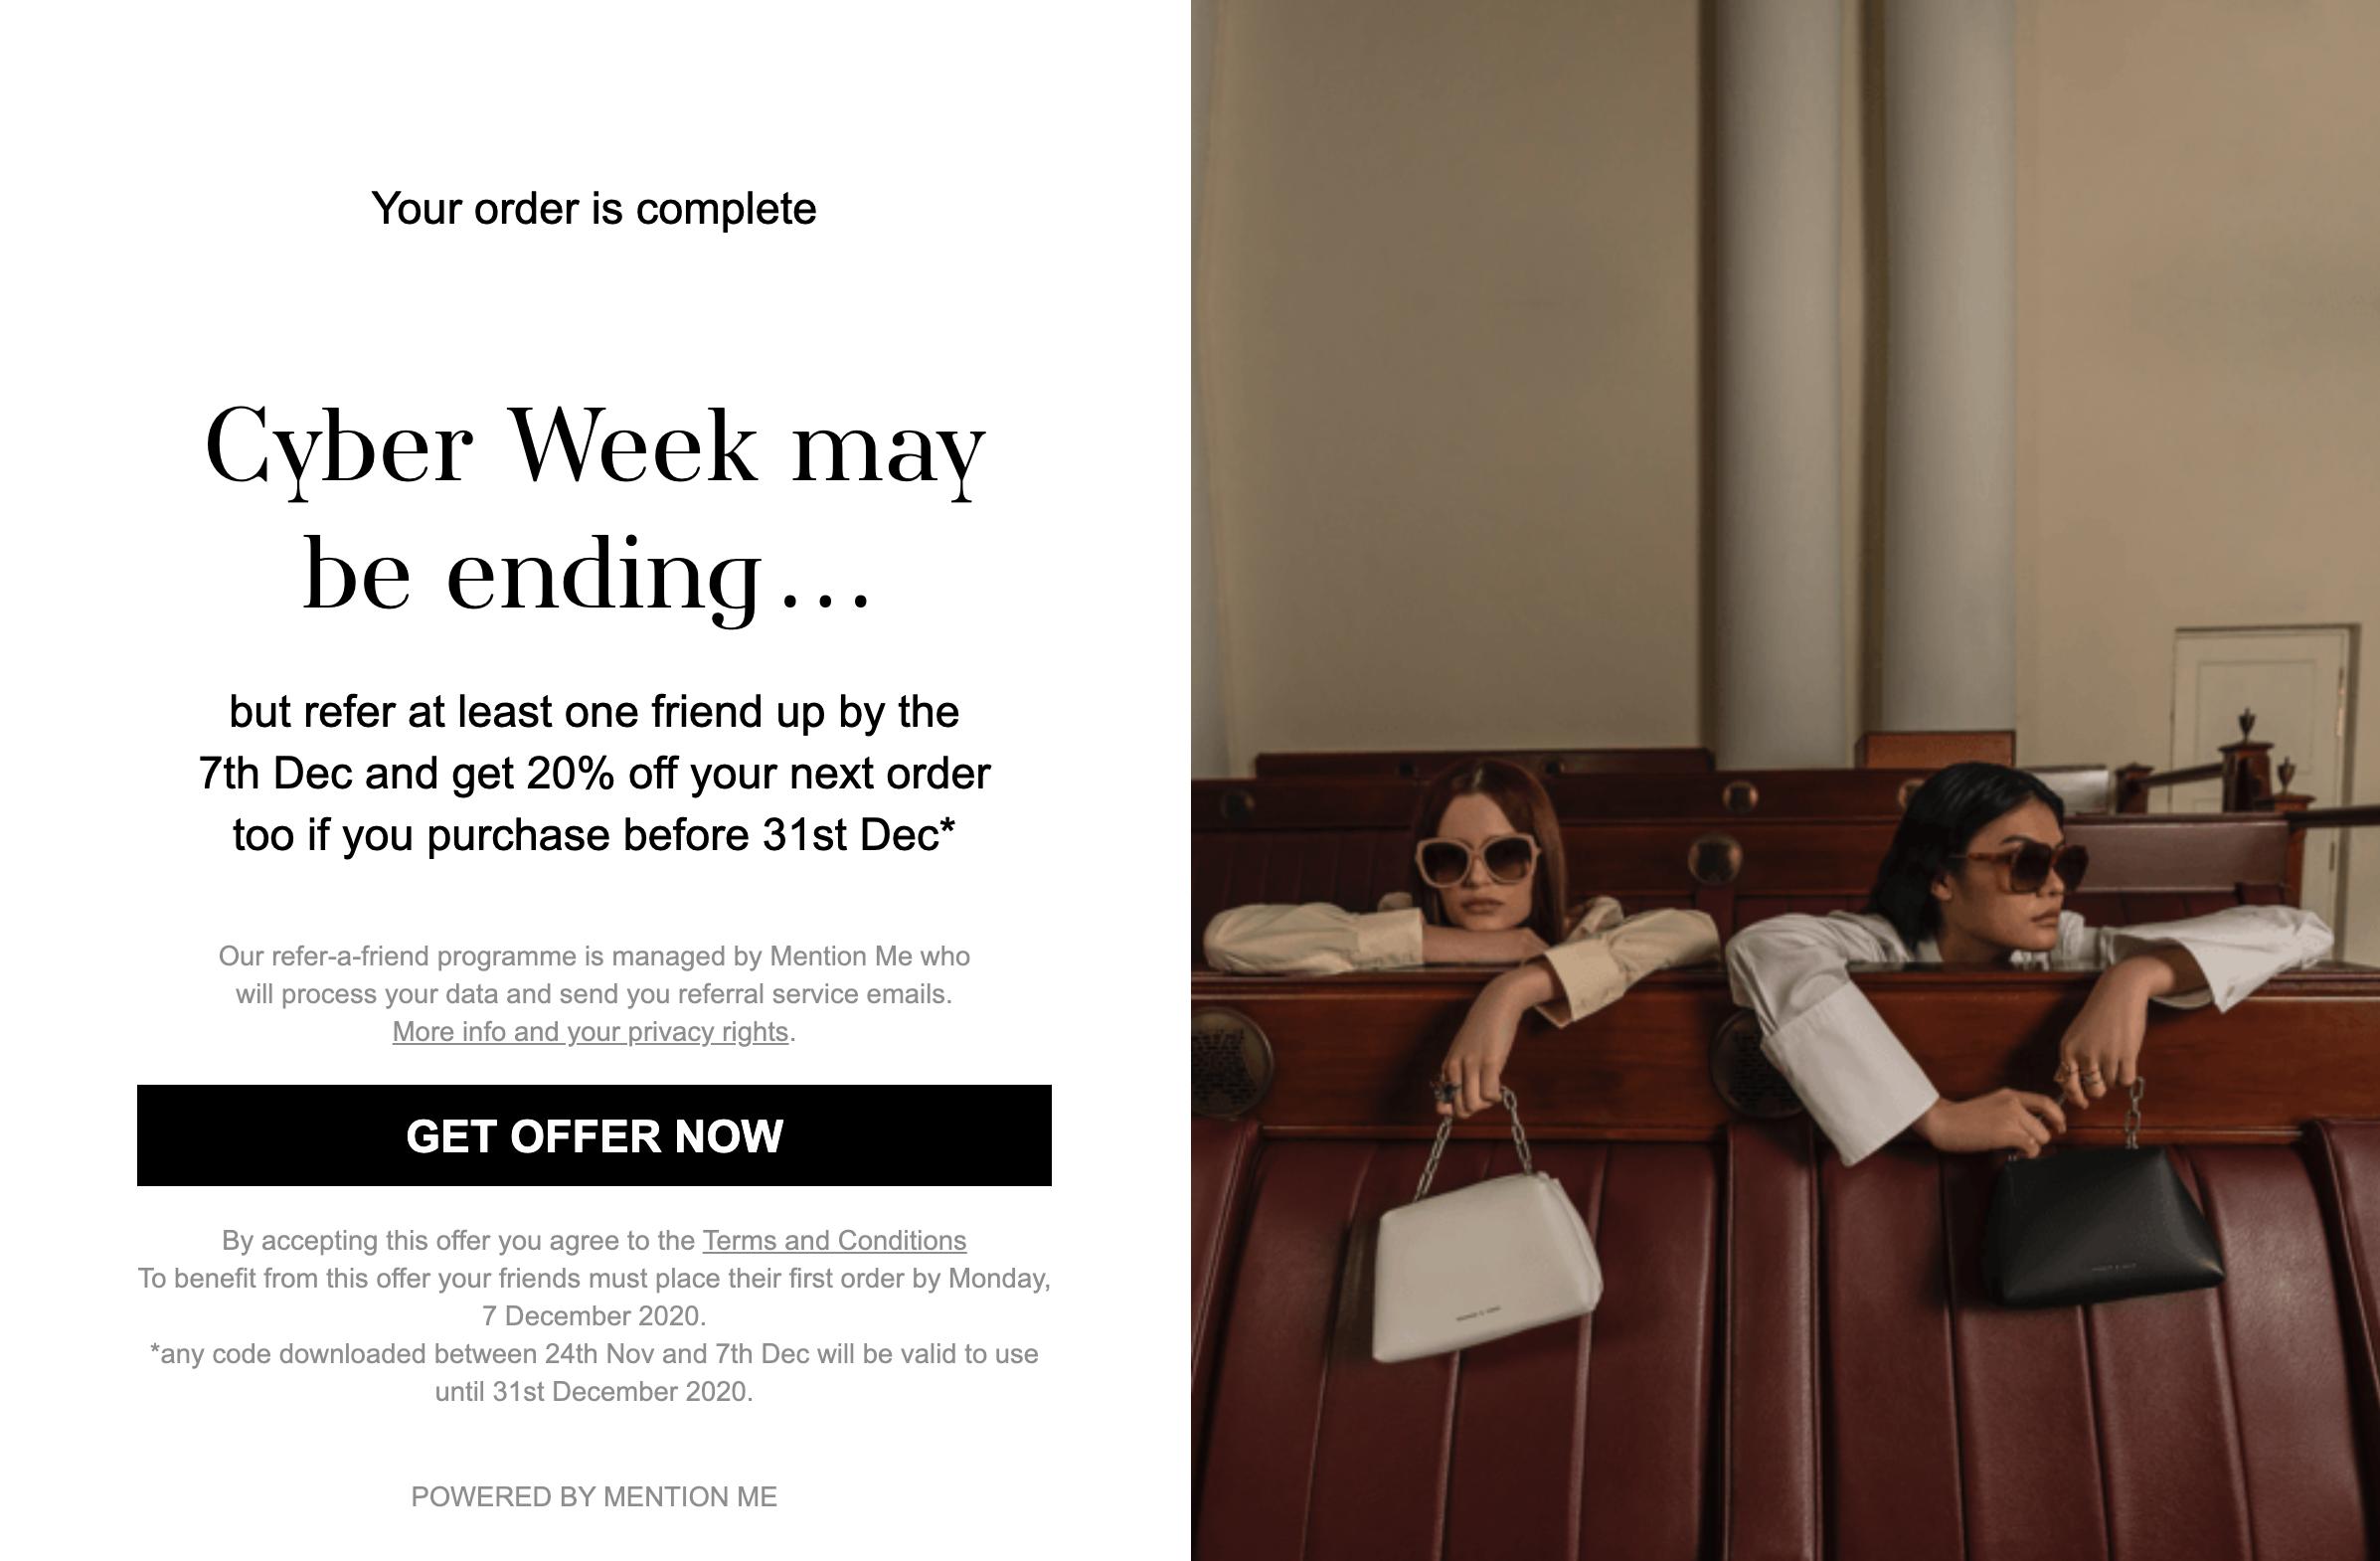 Charles & Keith Cyber Week Message